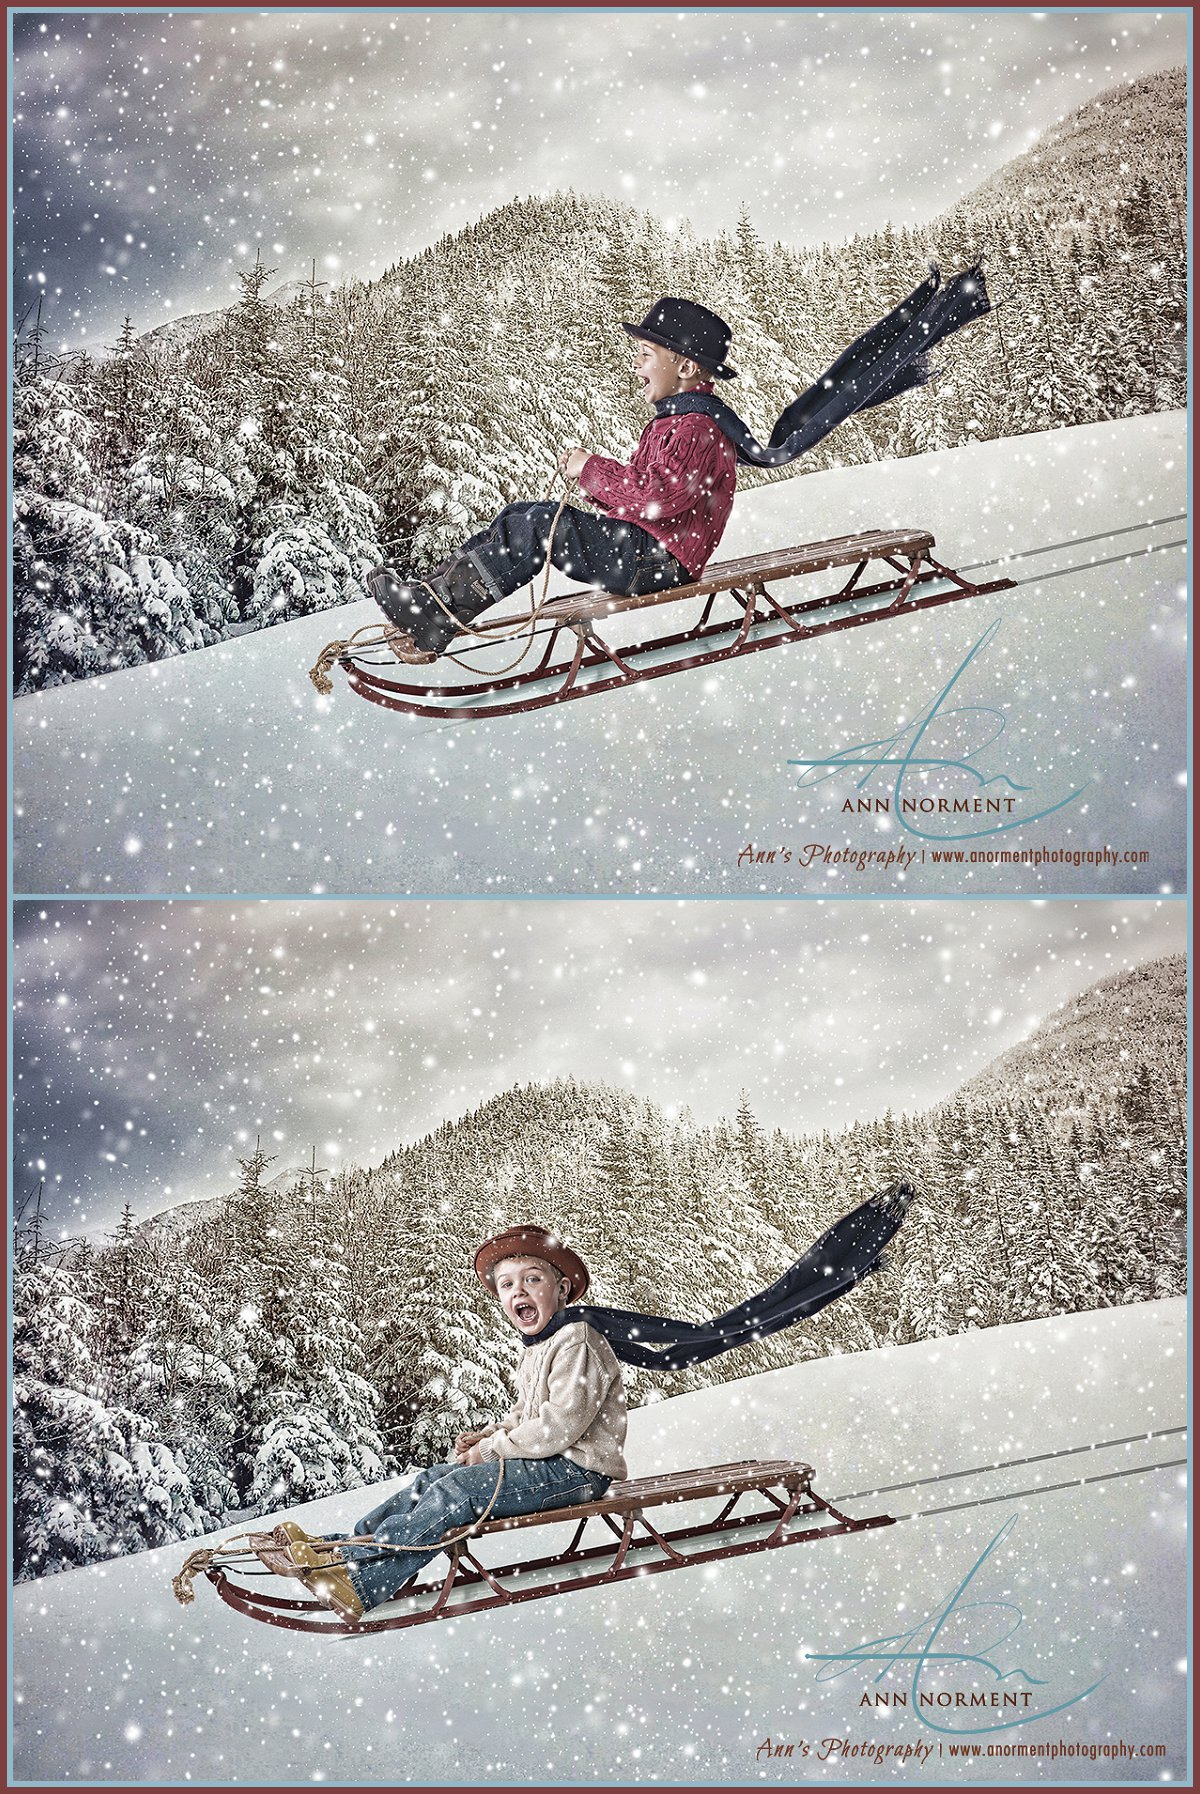 Family portraits - Luca & Dean - Ann's Photography